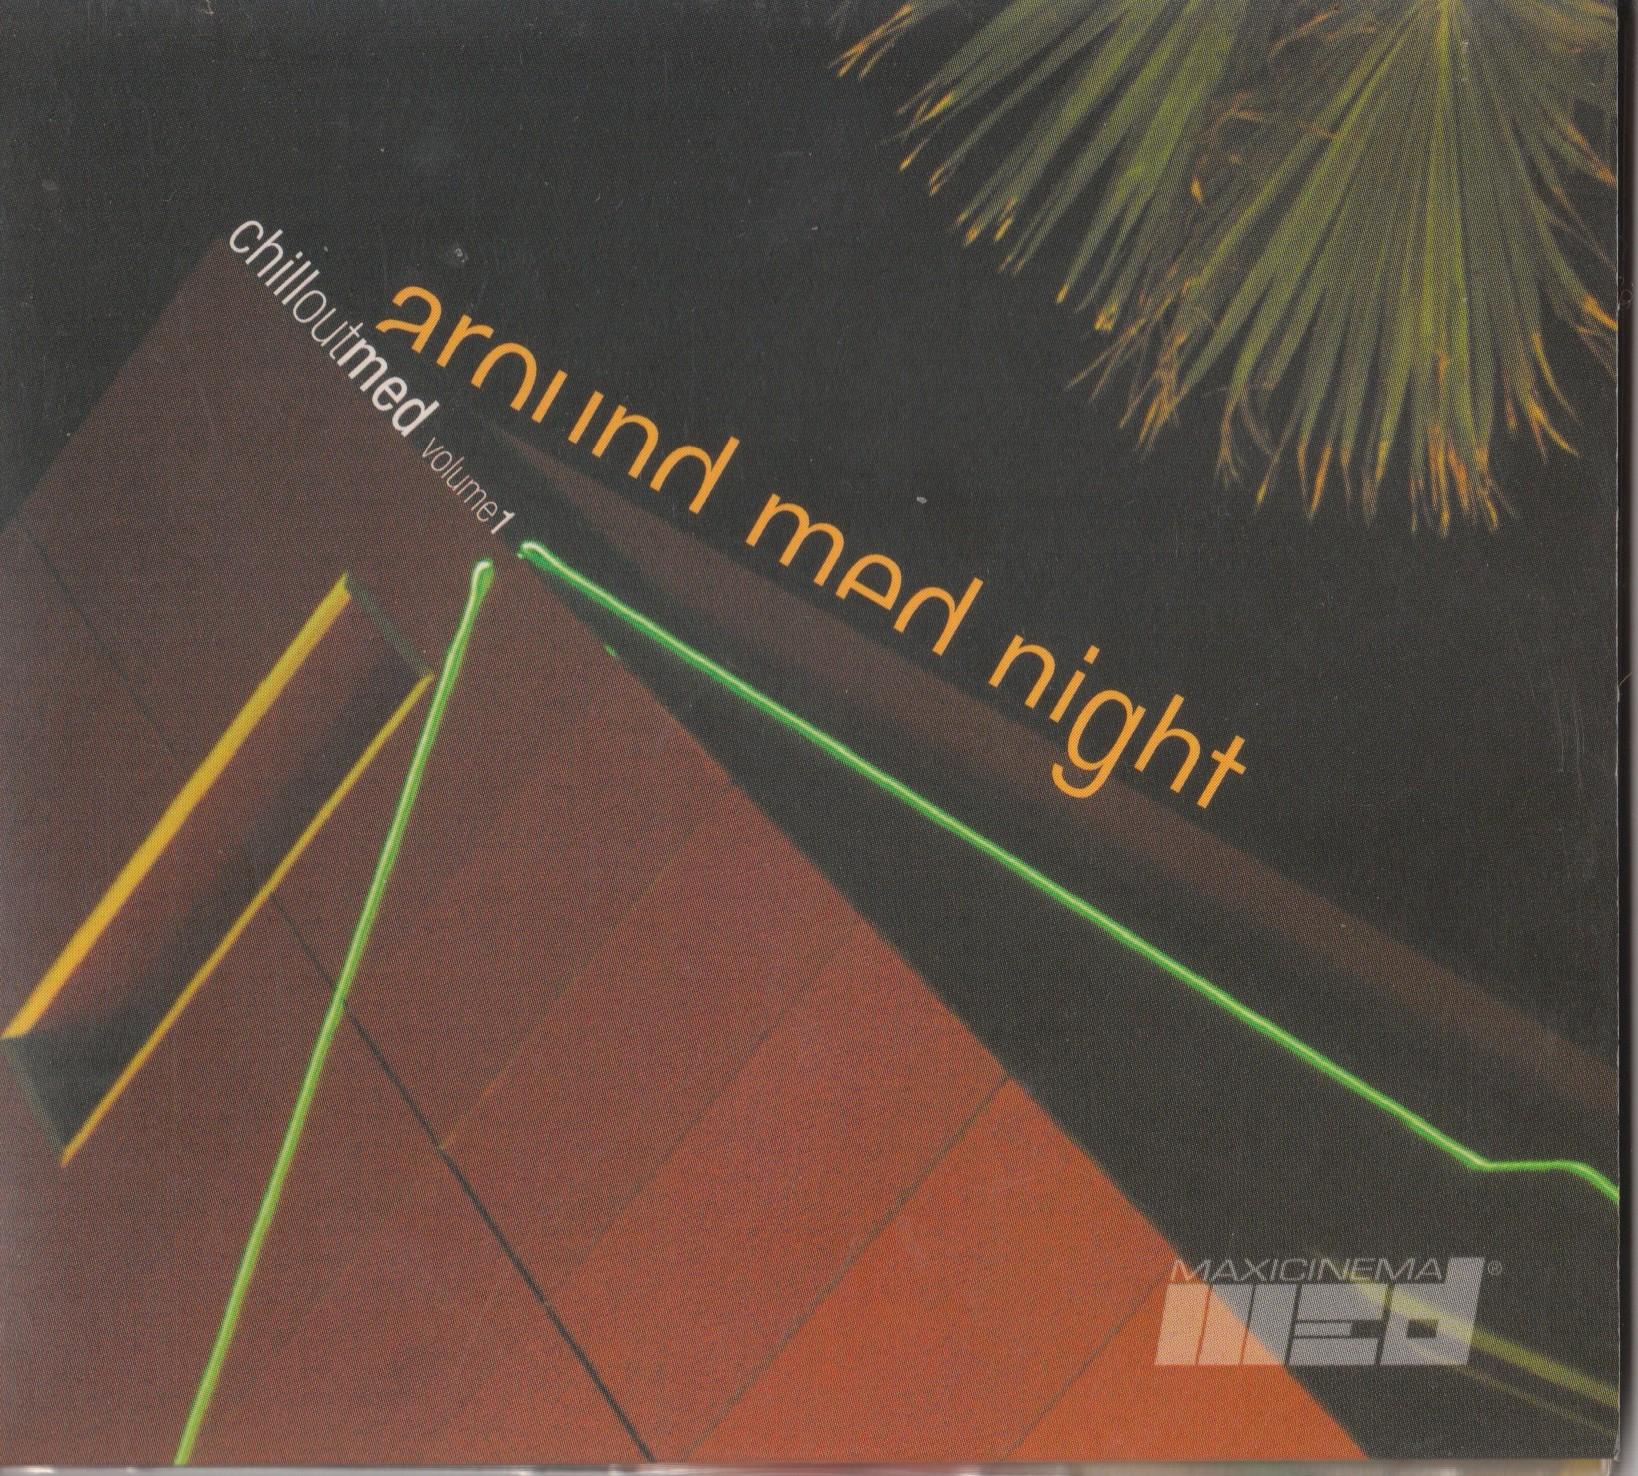 Bungt&#038;Bangt,Francesco Forni,Swaroopa</br>&#8220;Around MED Night&#8221;